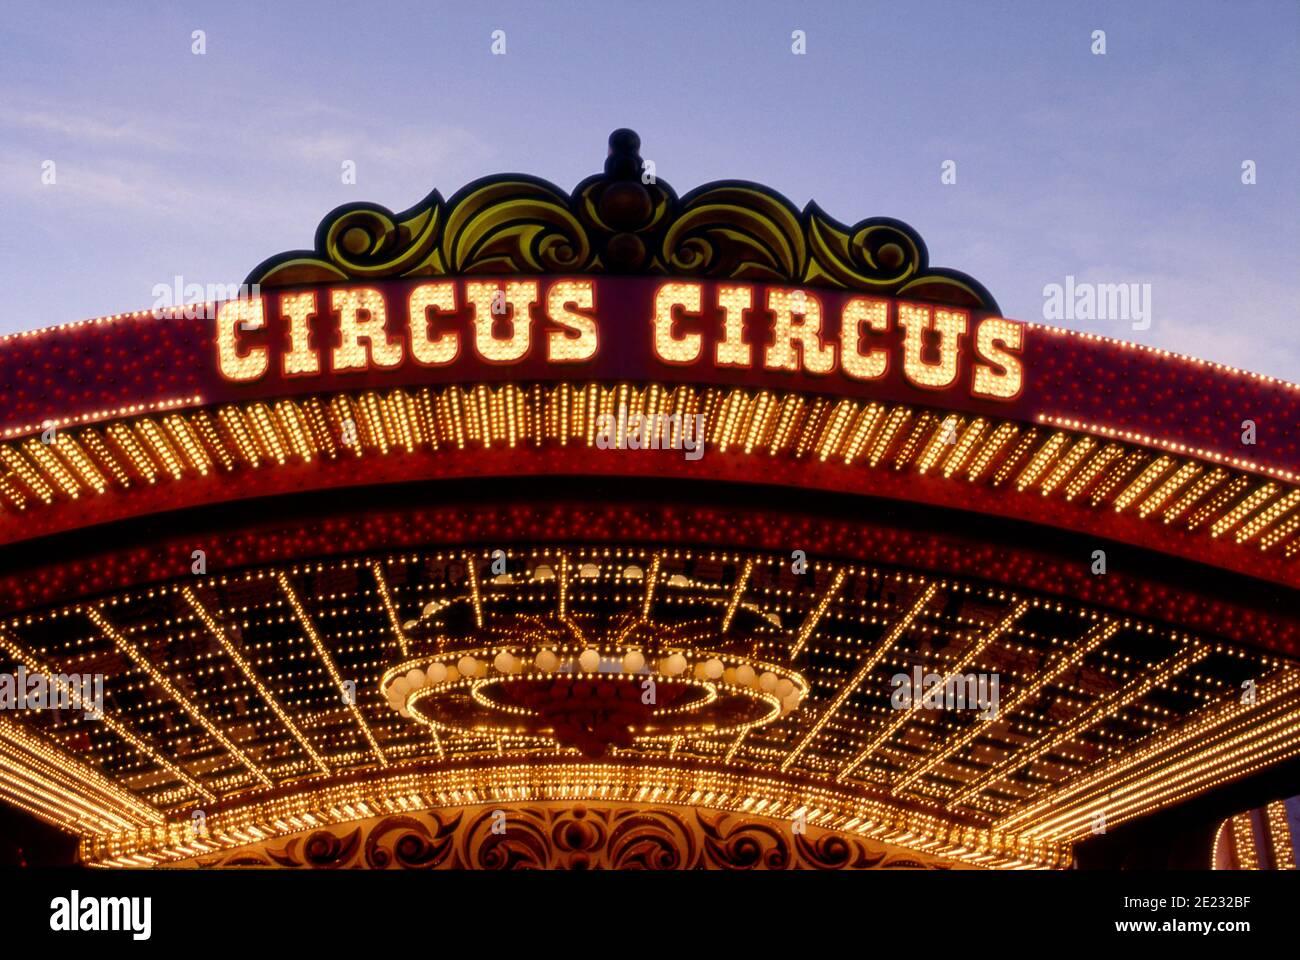 Eintritt zum Circus Circus Hotel und Casino in Las Vegas, Nevada Stockfoto